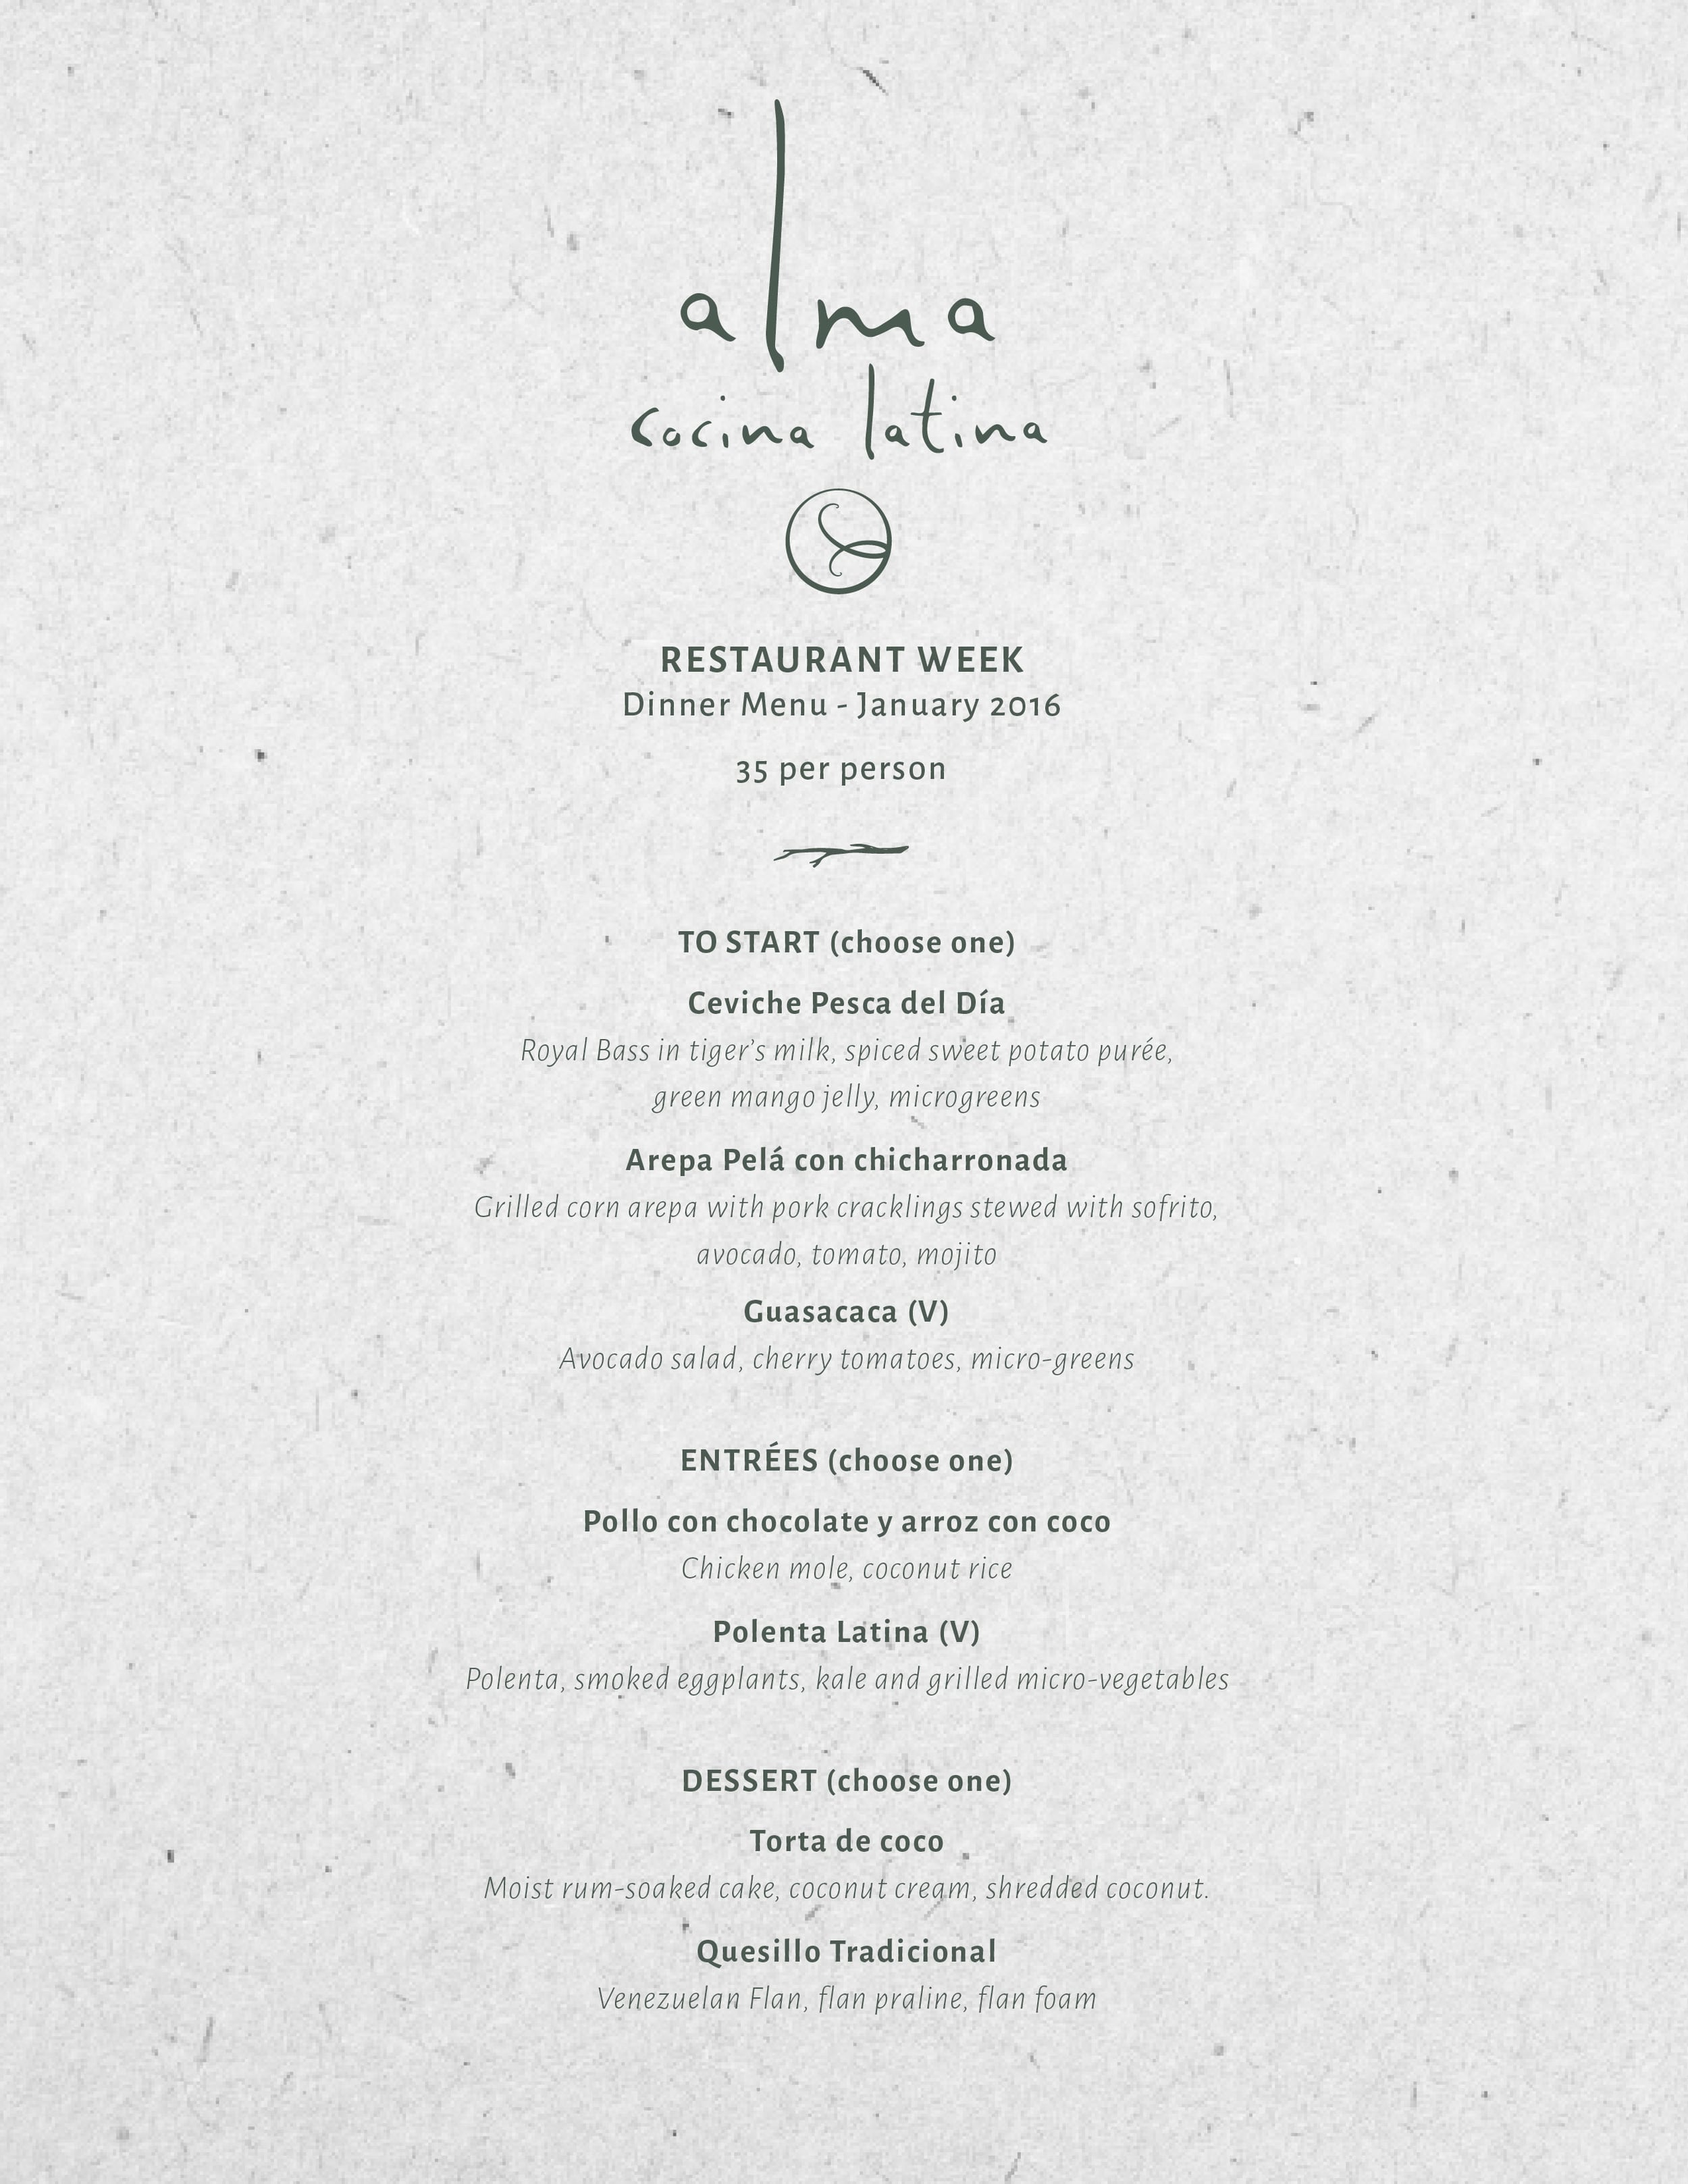 Restaurant Week At Alma S Alma